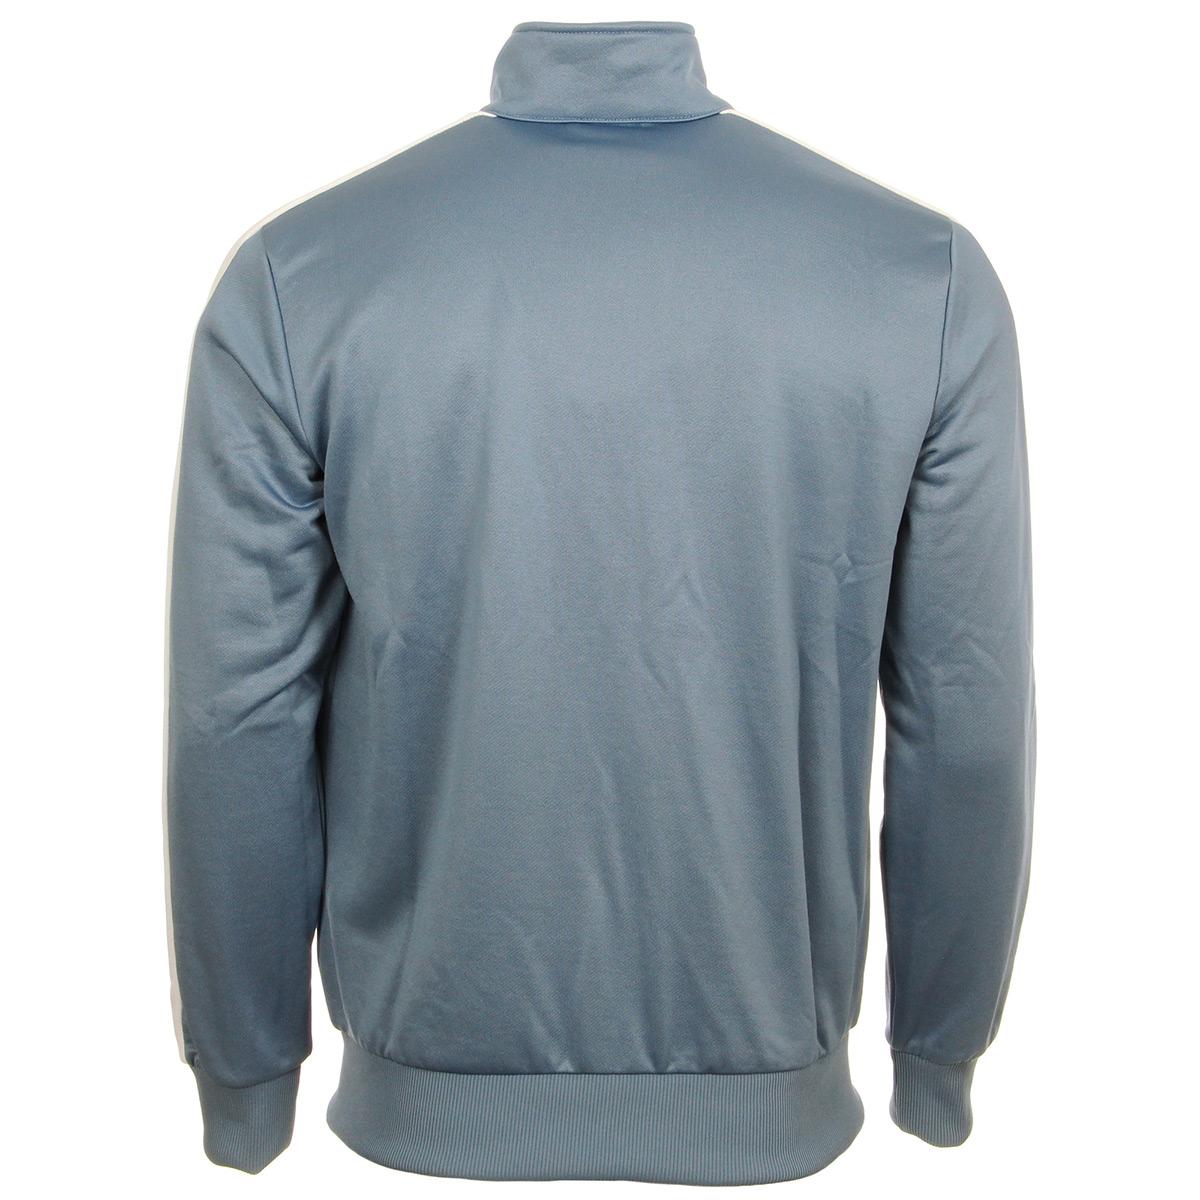 Puma Archive T7 Track Jacket 57265875, Vestes sport